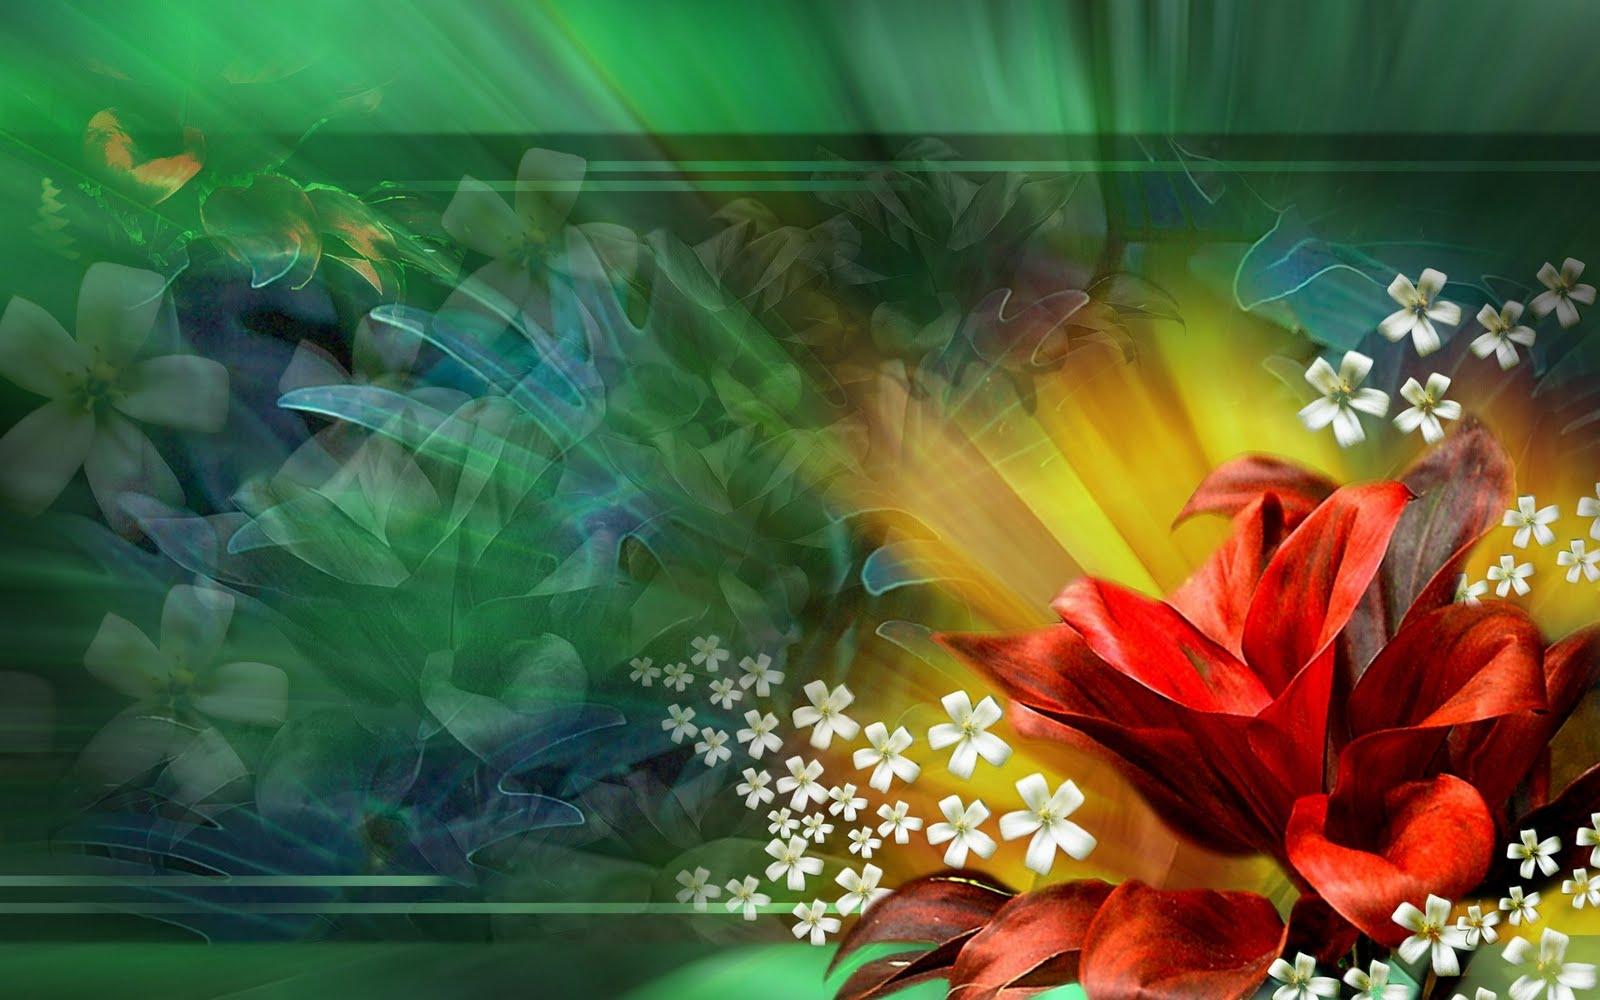 Beautiful Flowers Wallpaper   1920 x 1200 Hd Desktop Wallpaper 1600x1000